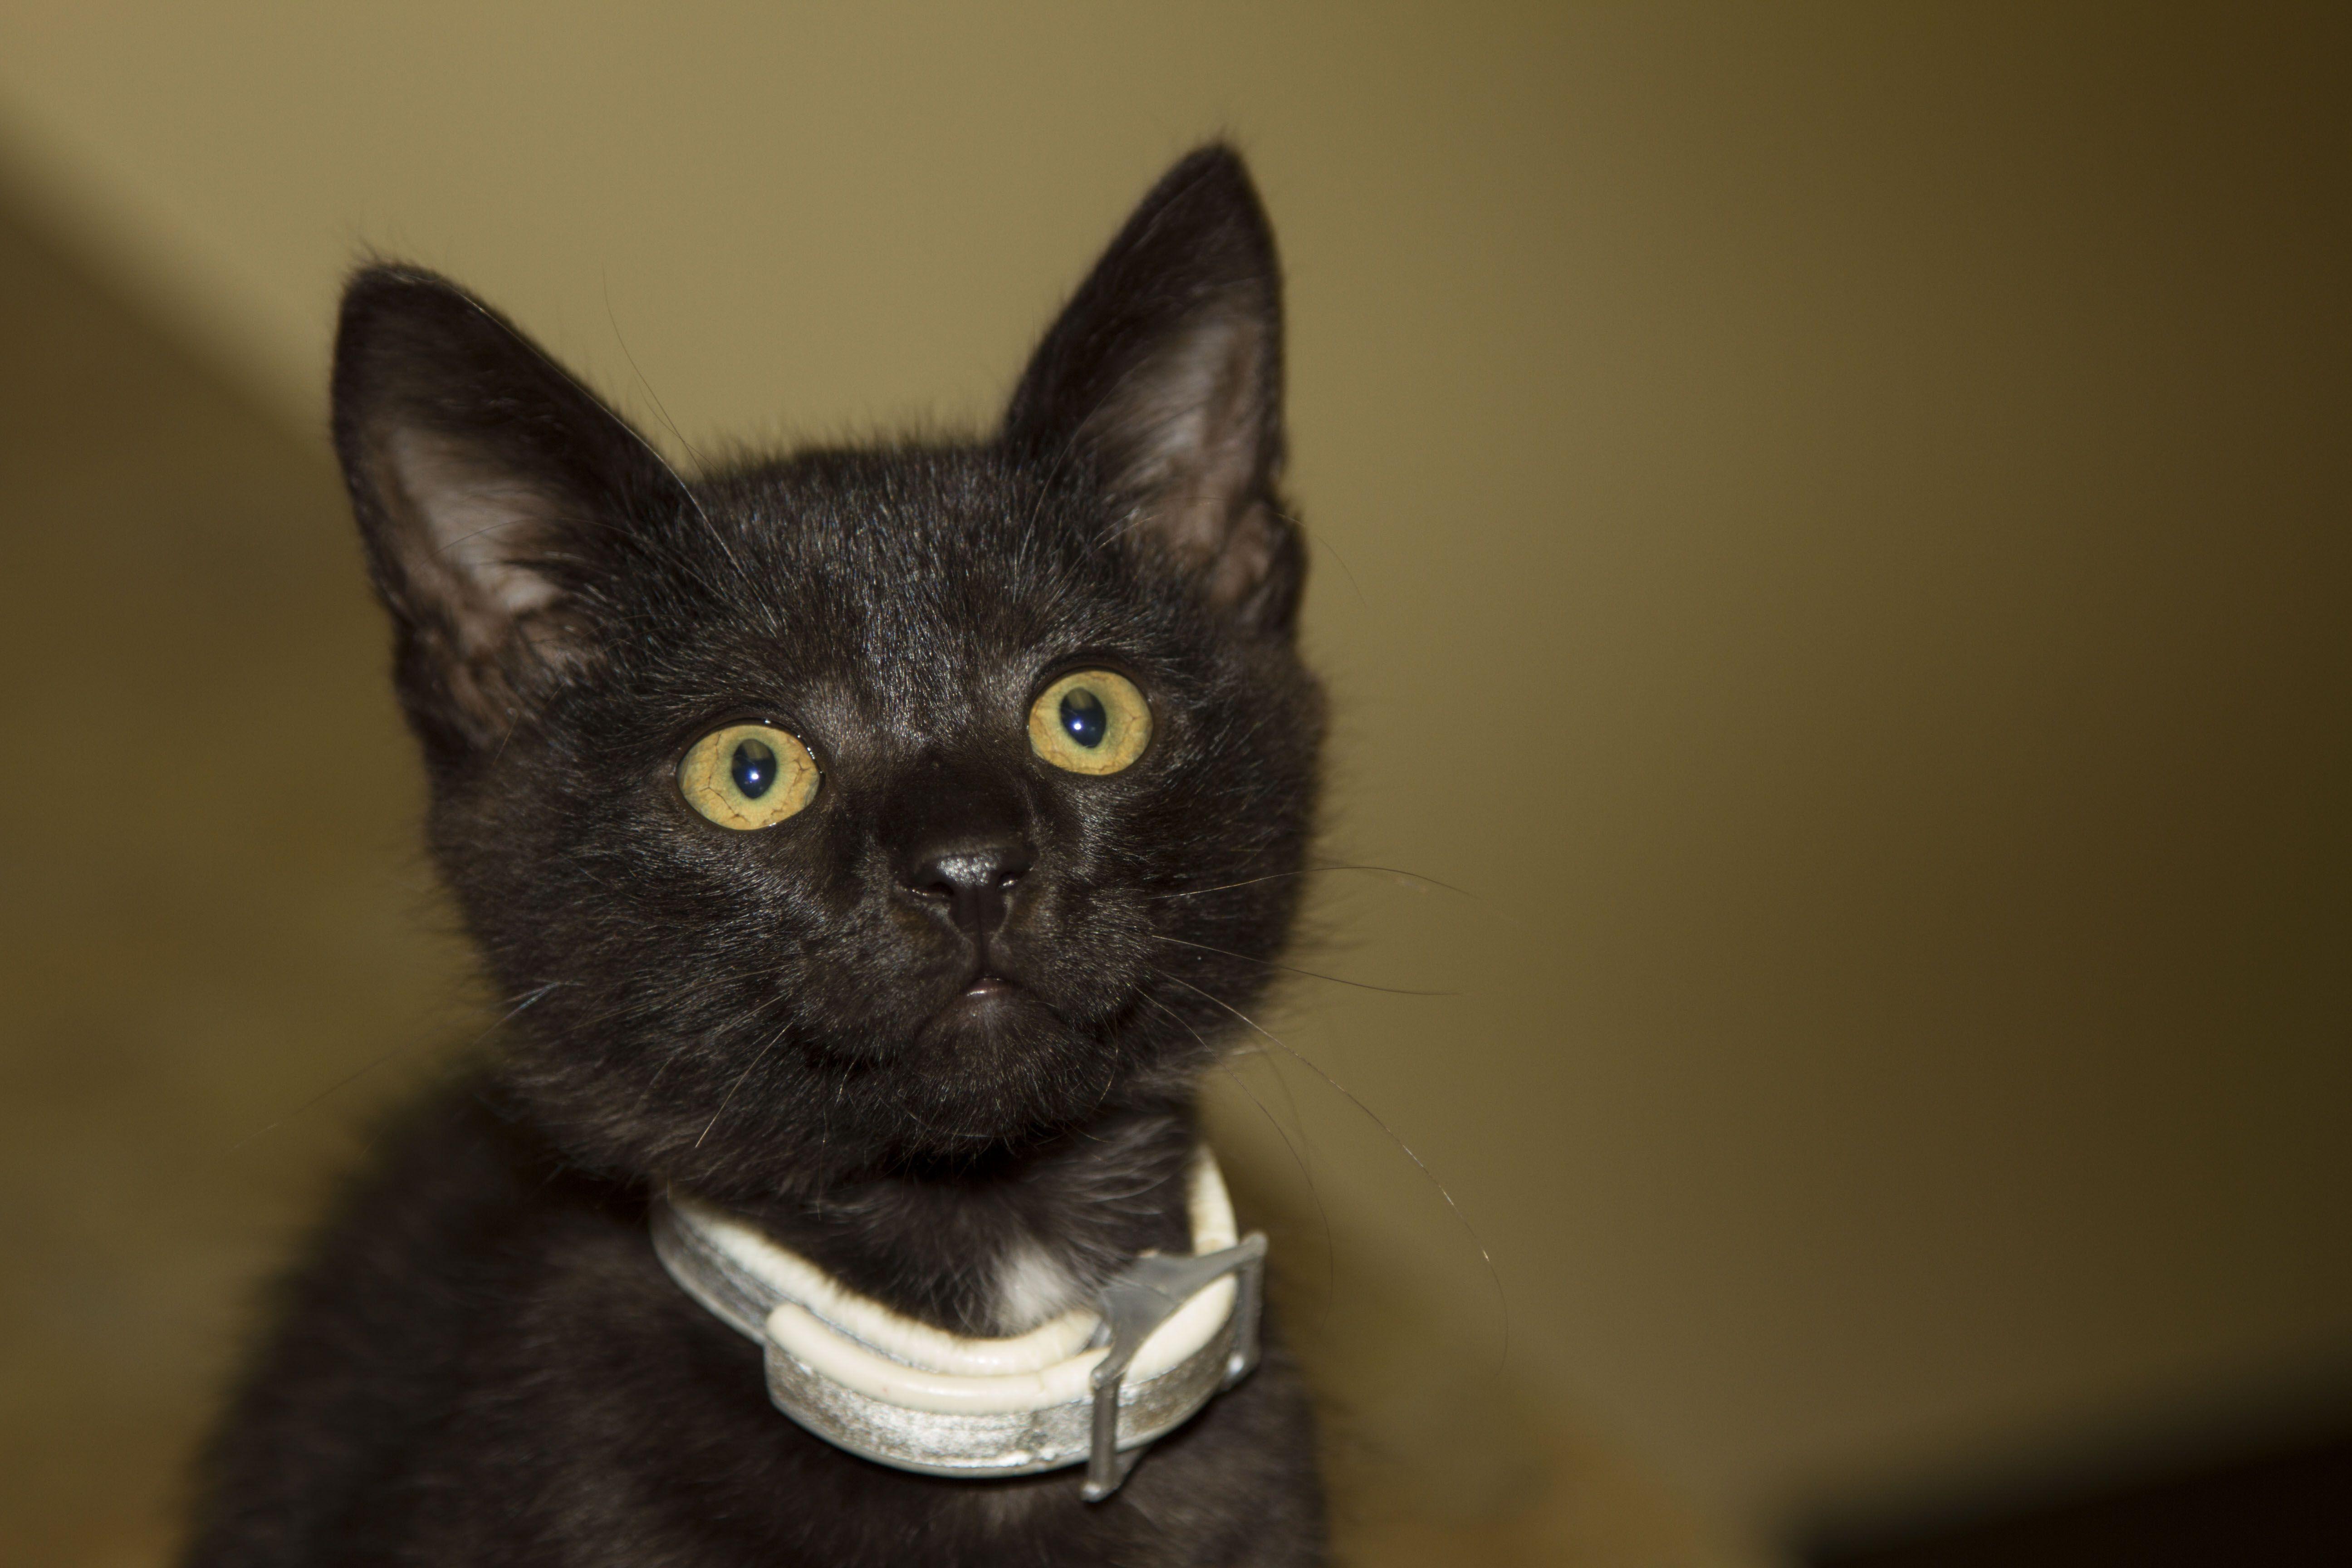 This Innocent Looking But Feisty Kitten S Name Is Tink Kitten Names Kittens Animal Hospital